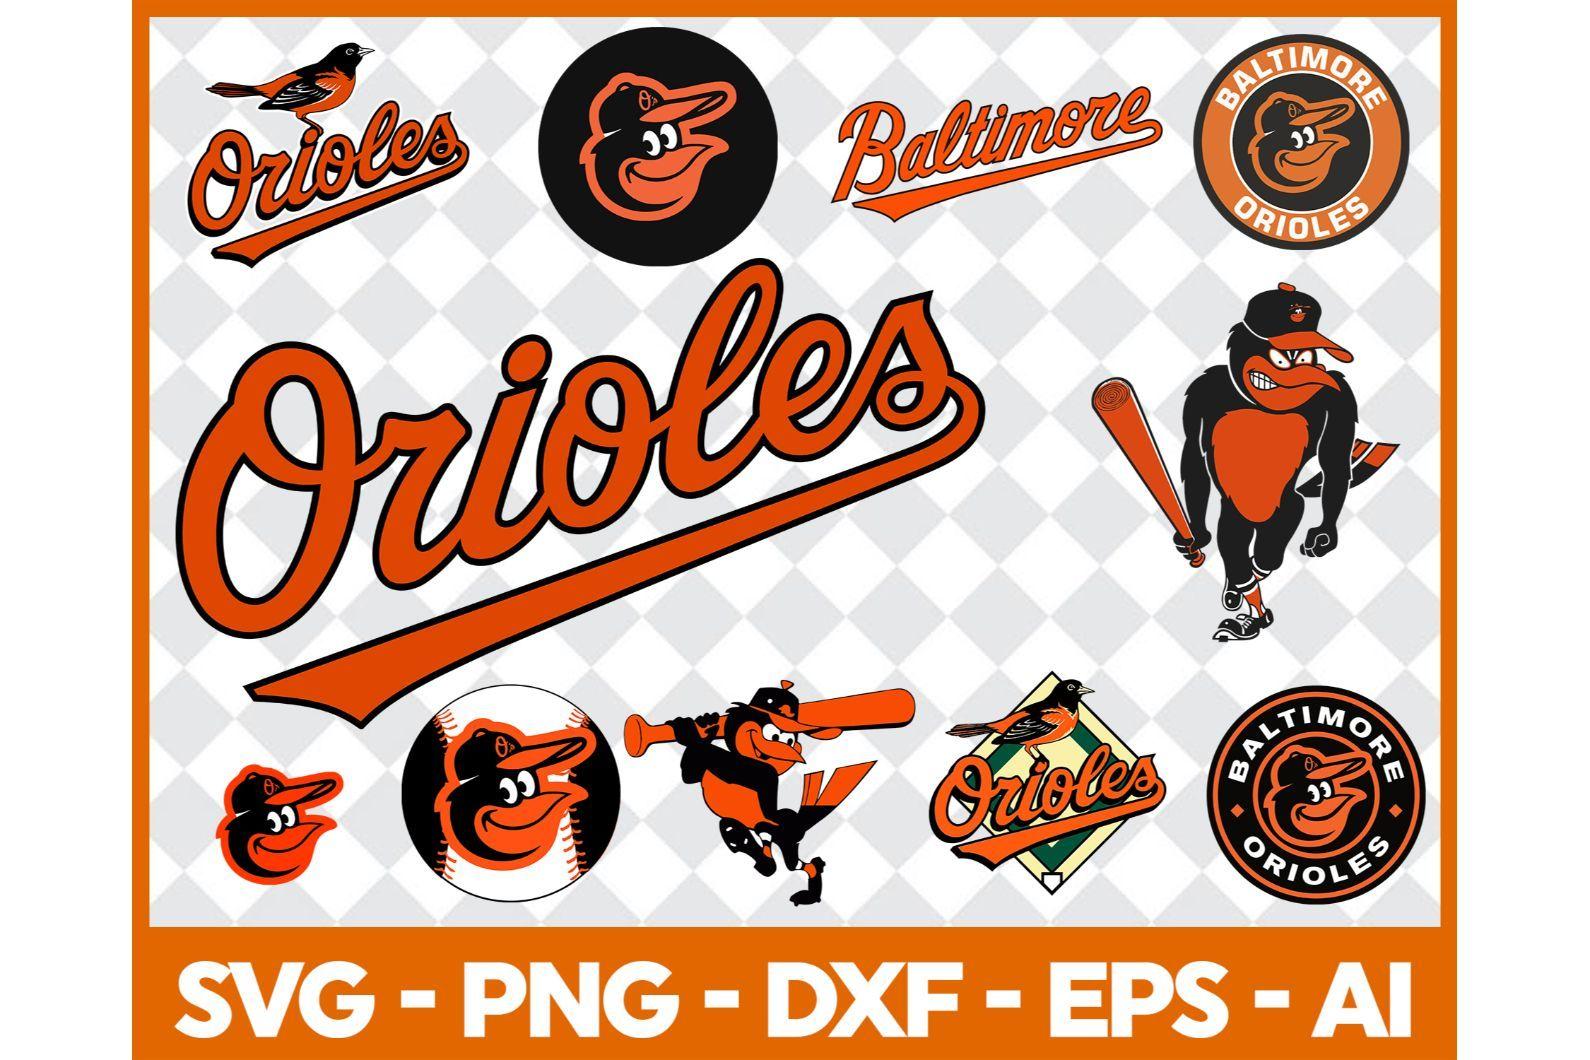 Baltimore Orioles Mlb Svg Baseball Svg File Baseball Logo Mlb Fabric Mlb Baseball Mlb Svg Basebal Baseball Svg Baltimore Orioles Baseball Orioles Baseball